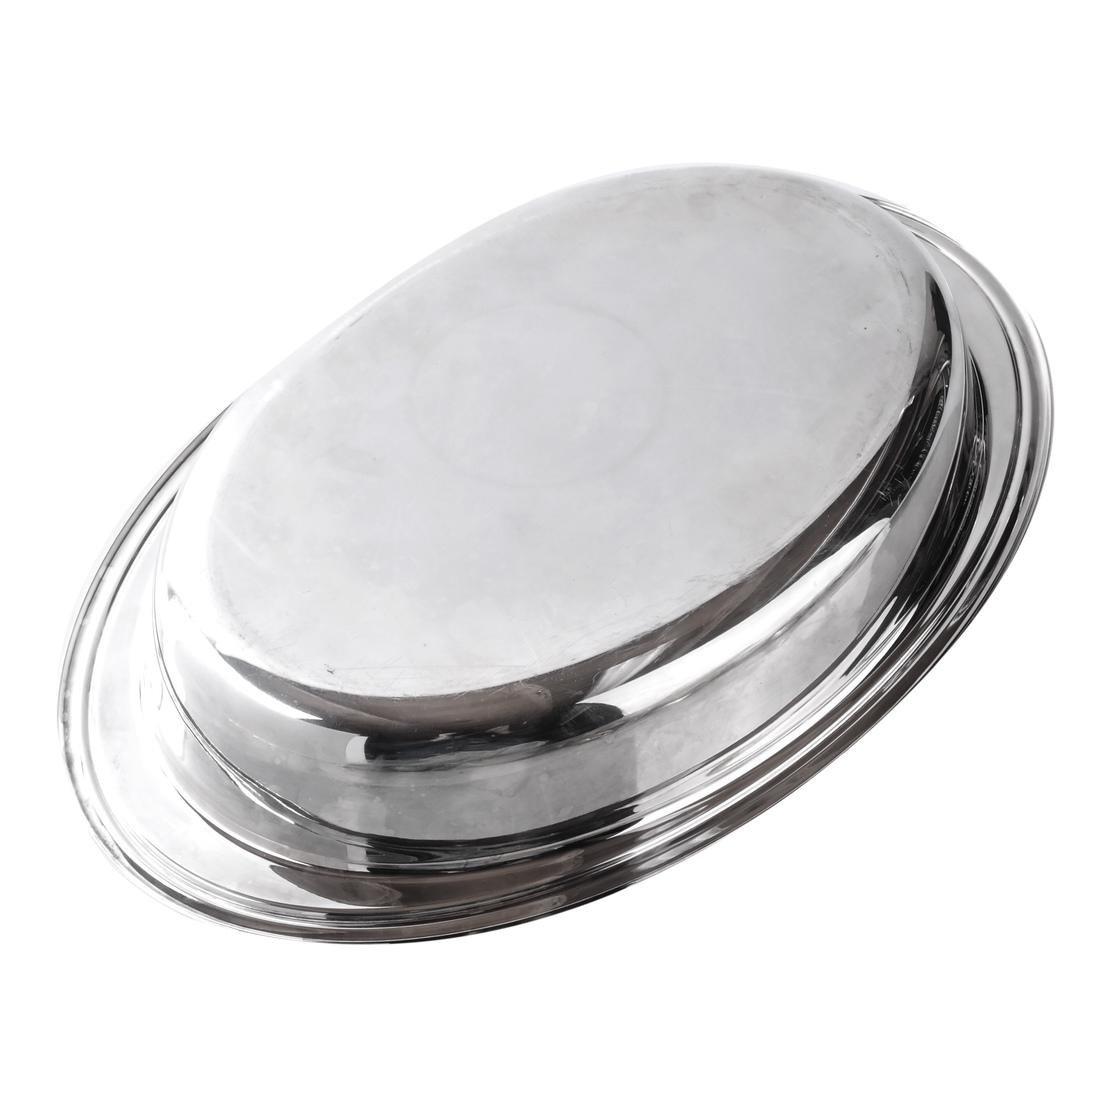 Christofle Silver Plate Deep Dish - 3